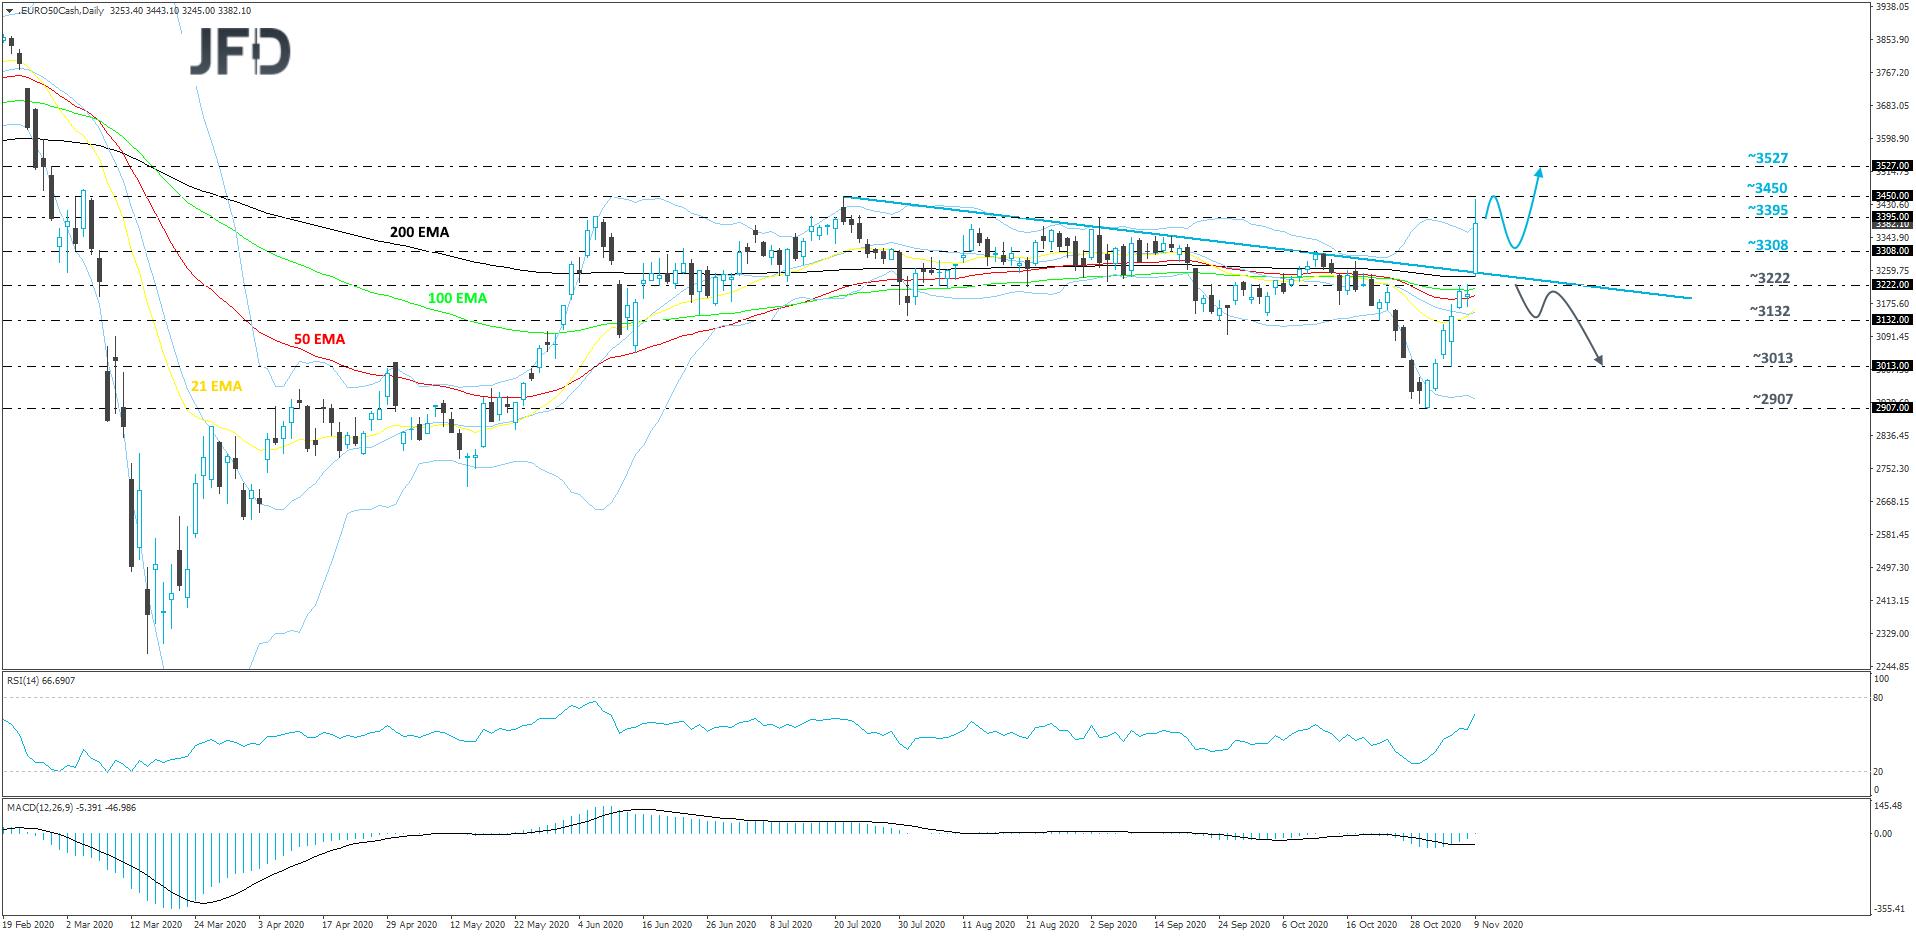 Euro stoxx 50 daily chart technical analysis